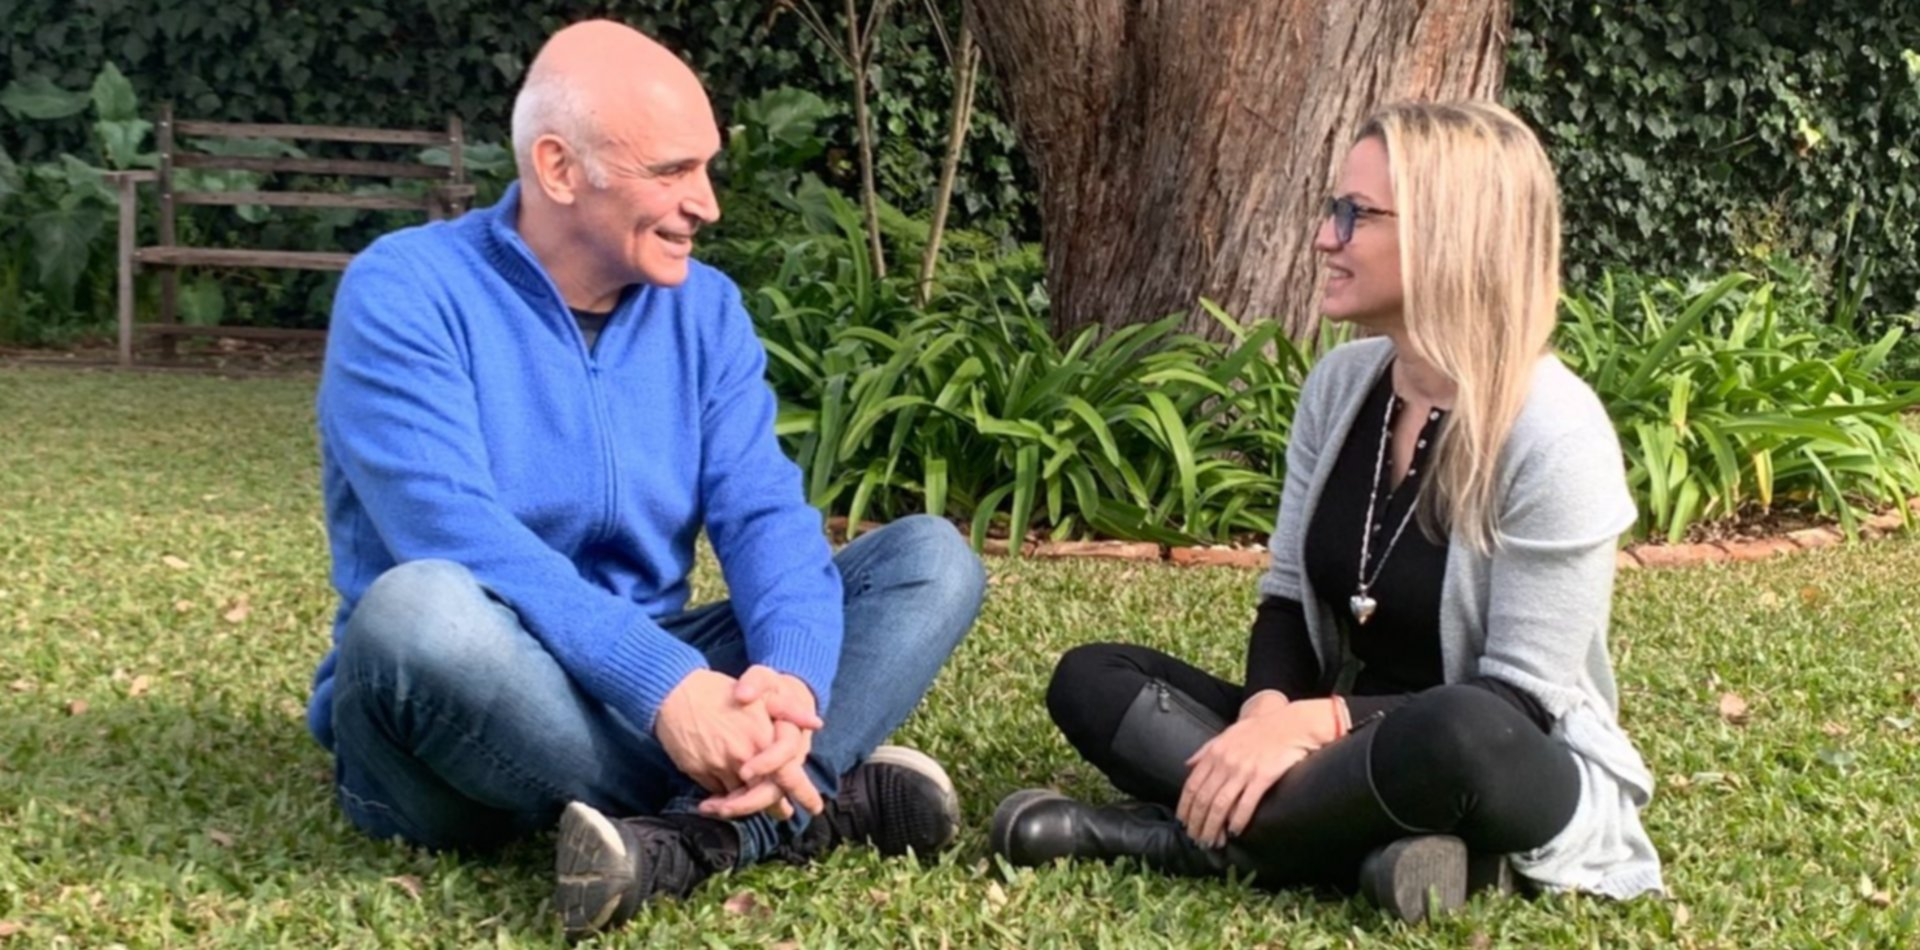 Después de romper con Garro, Carolina Piparo anunció que acompañará a Espert